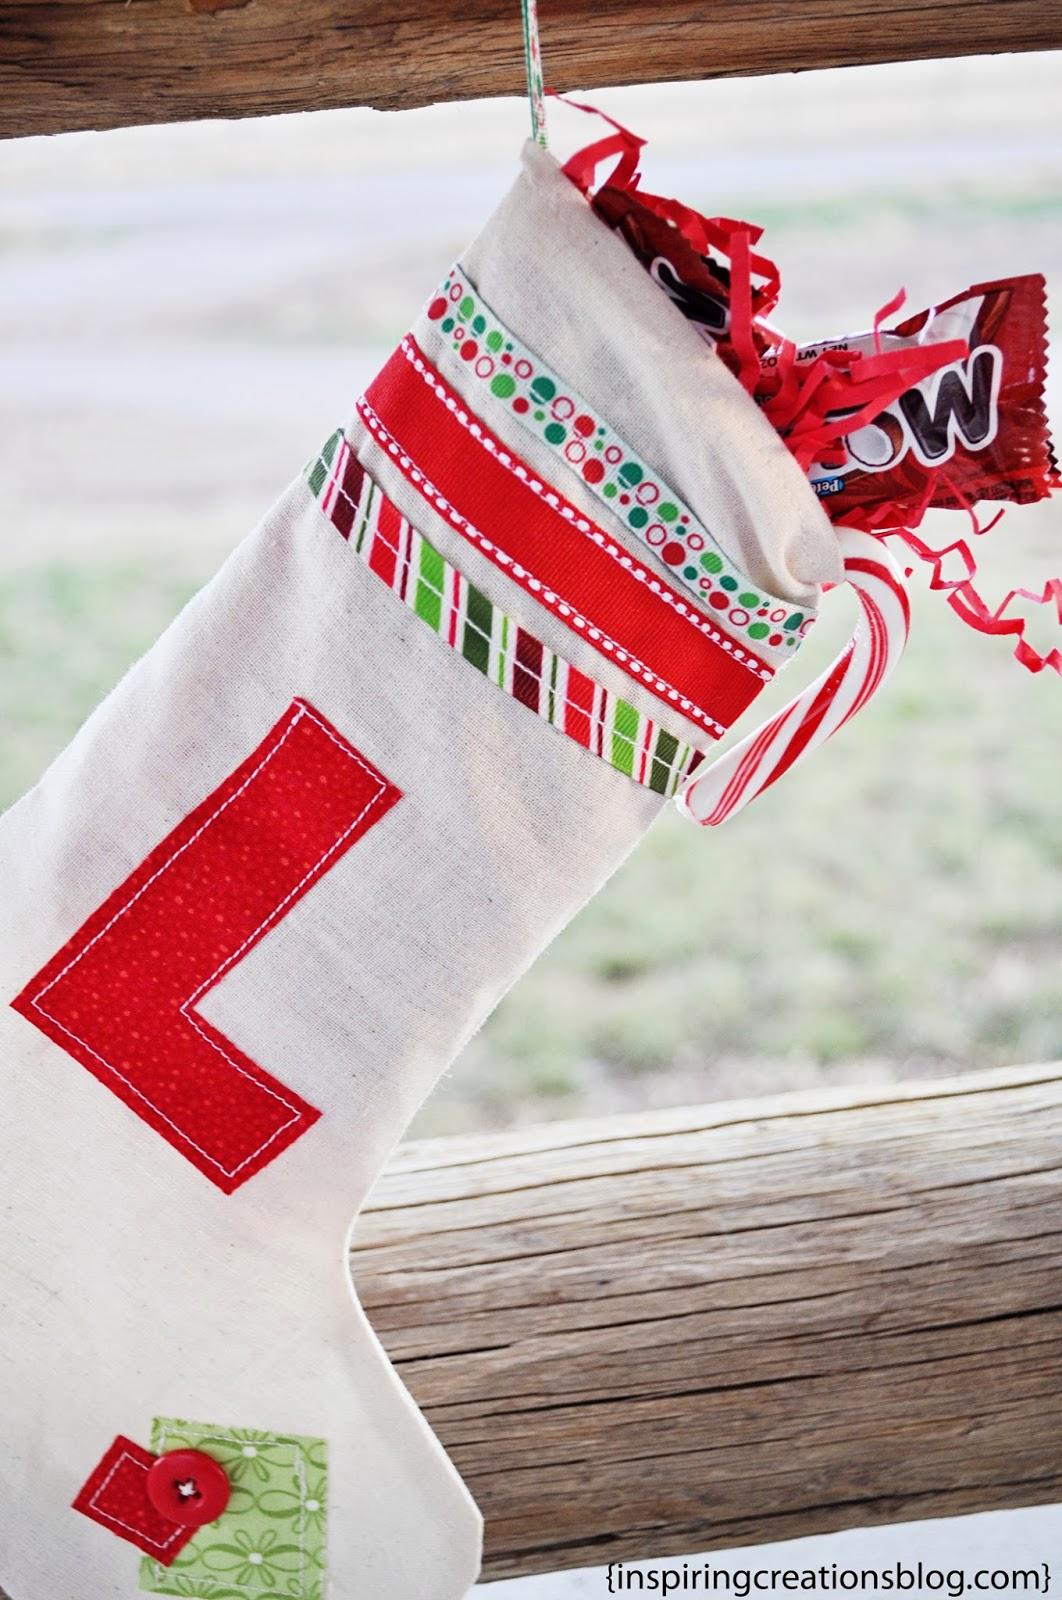 Inspiring Creations: DIY Monogrammed Stocking